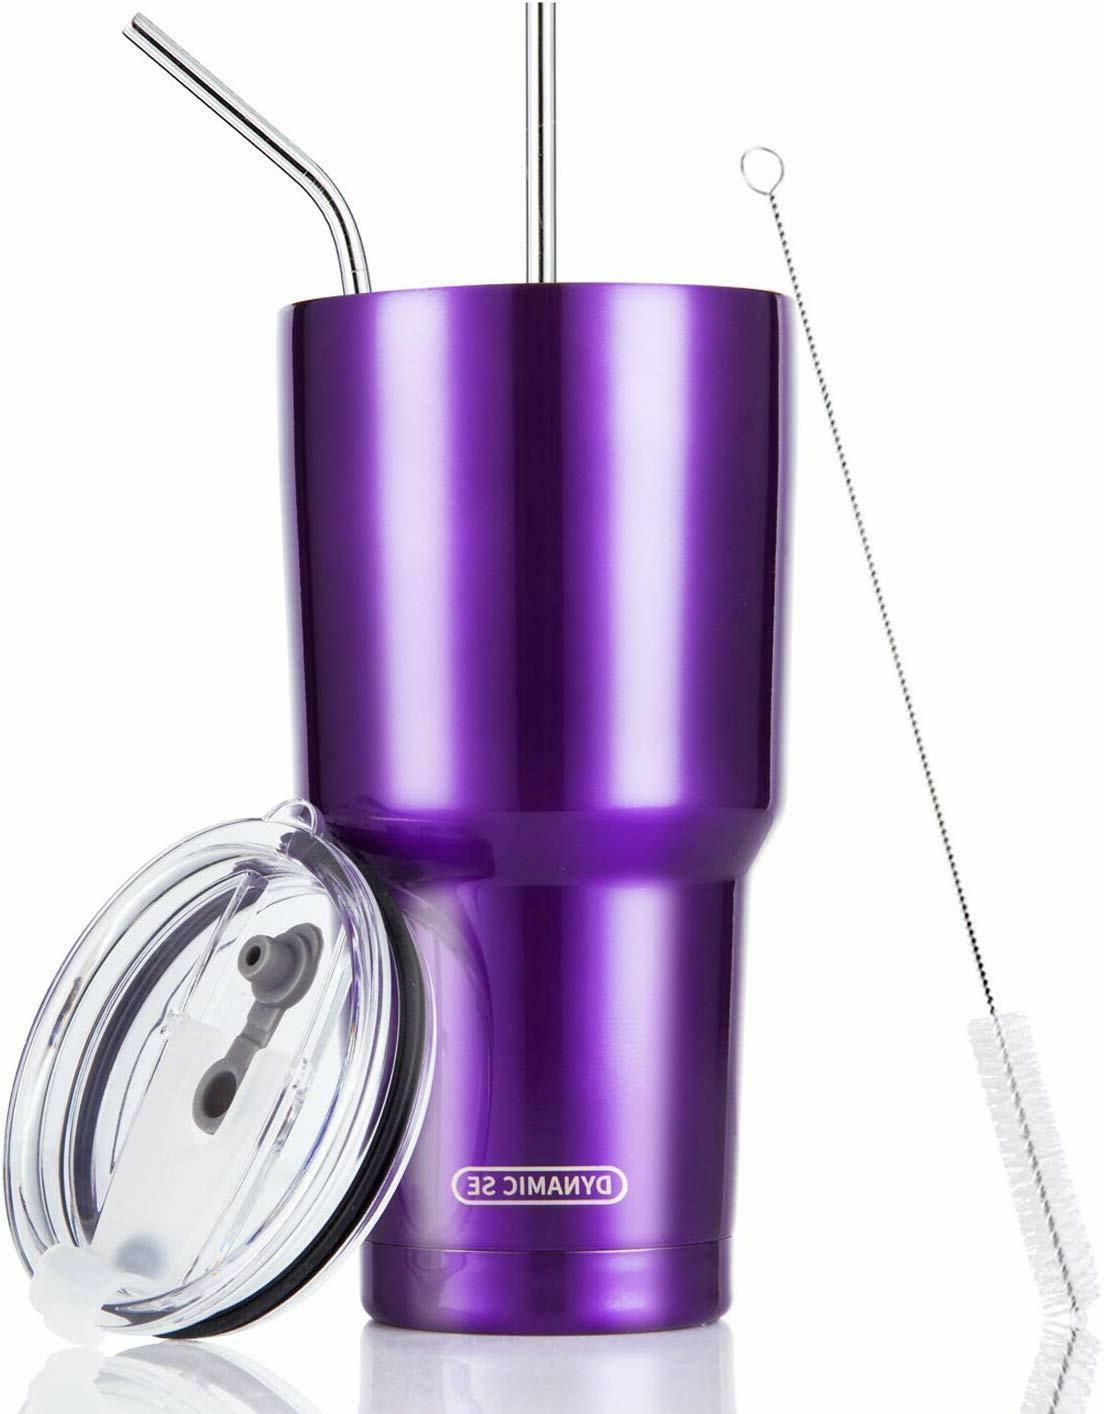 DYNAMIC SE Tumbler Steel Vacuum Mug